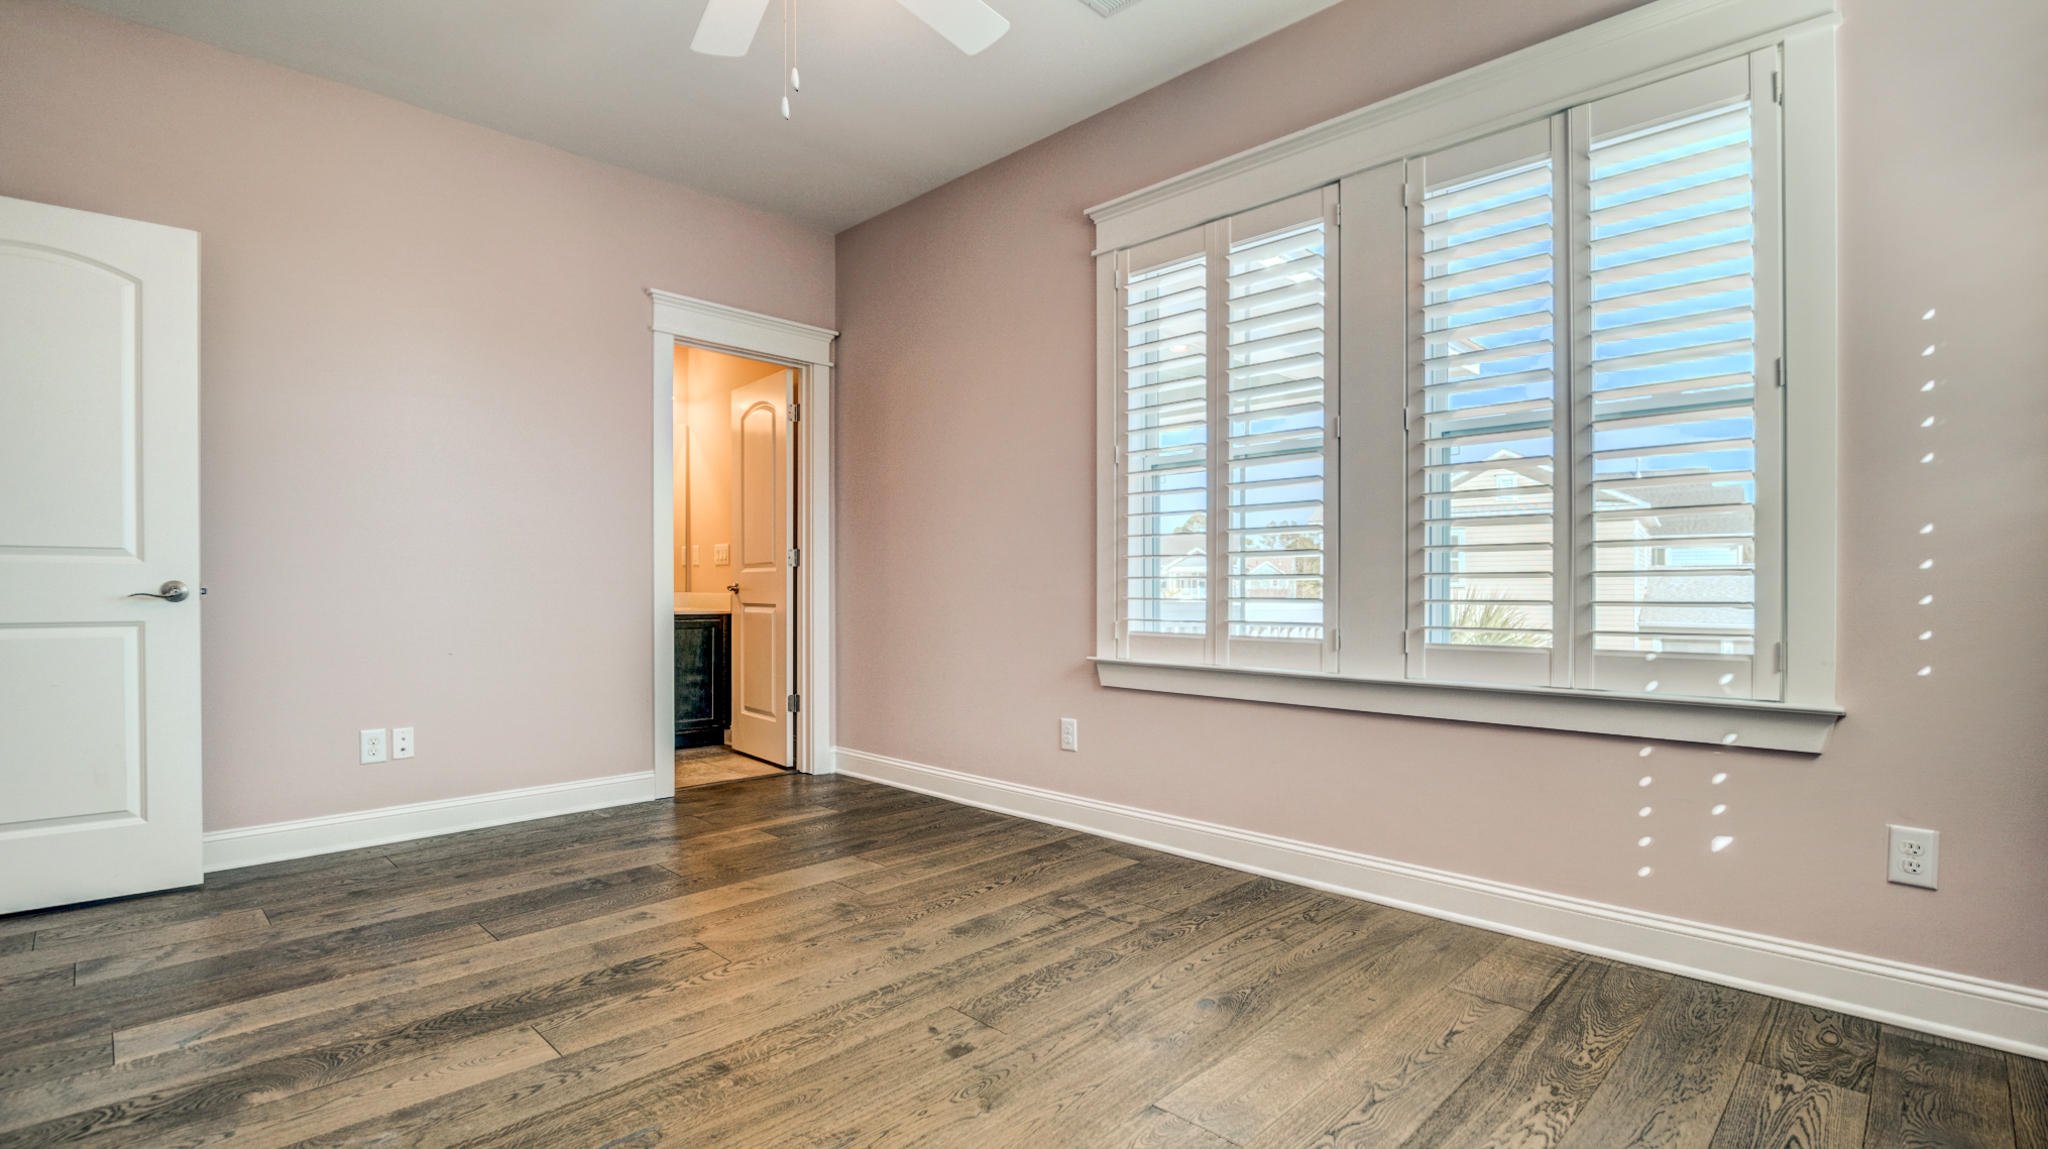 Carolina Park Homes For Sale - 3687 Spindrift, Mount Pleasant, SC - 28